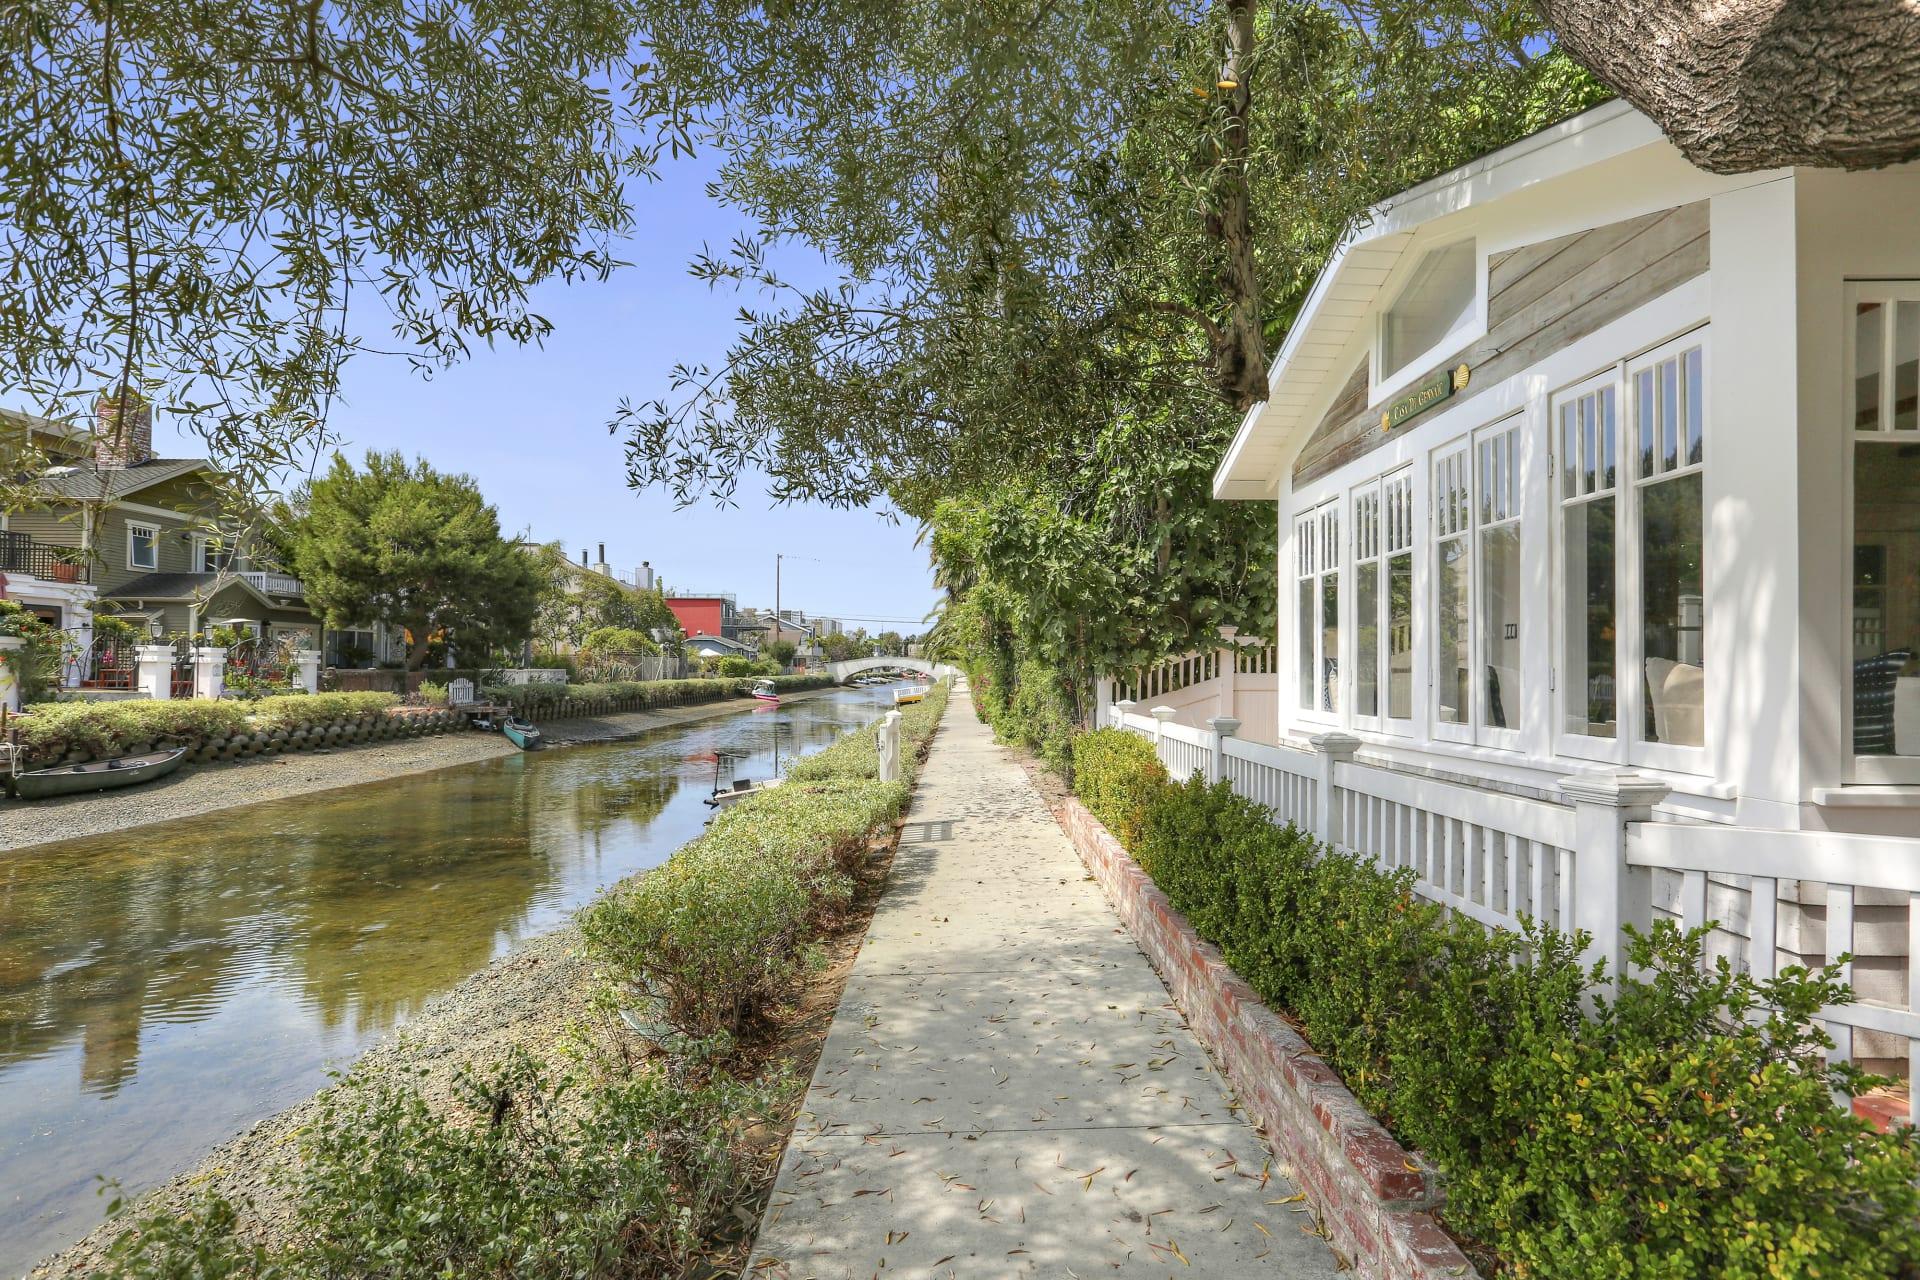 437 Linnie Canal photo